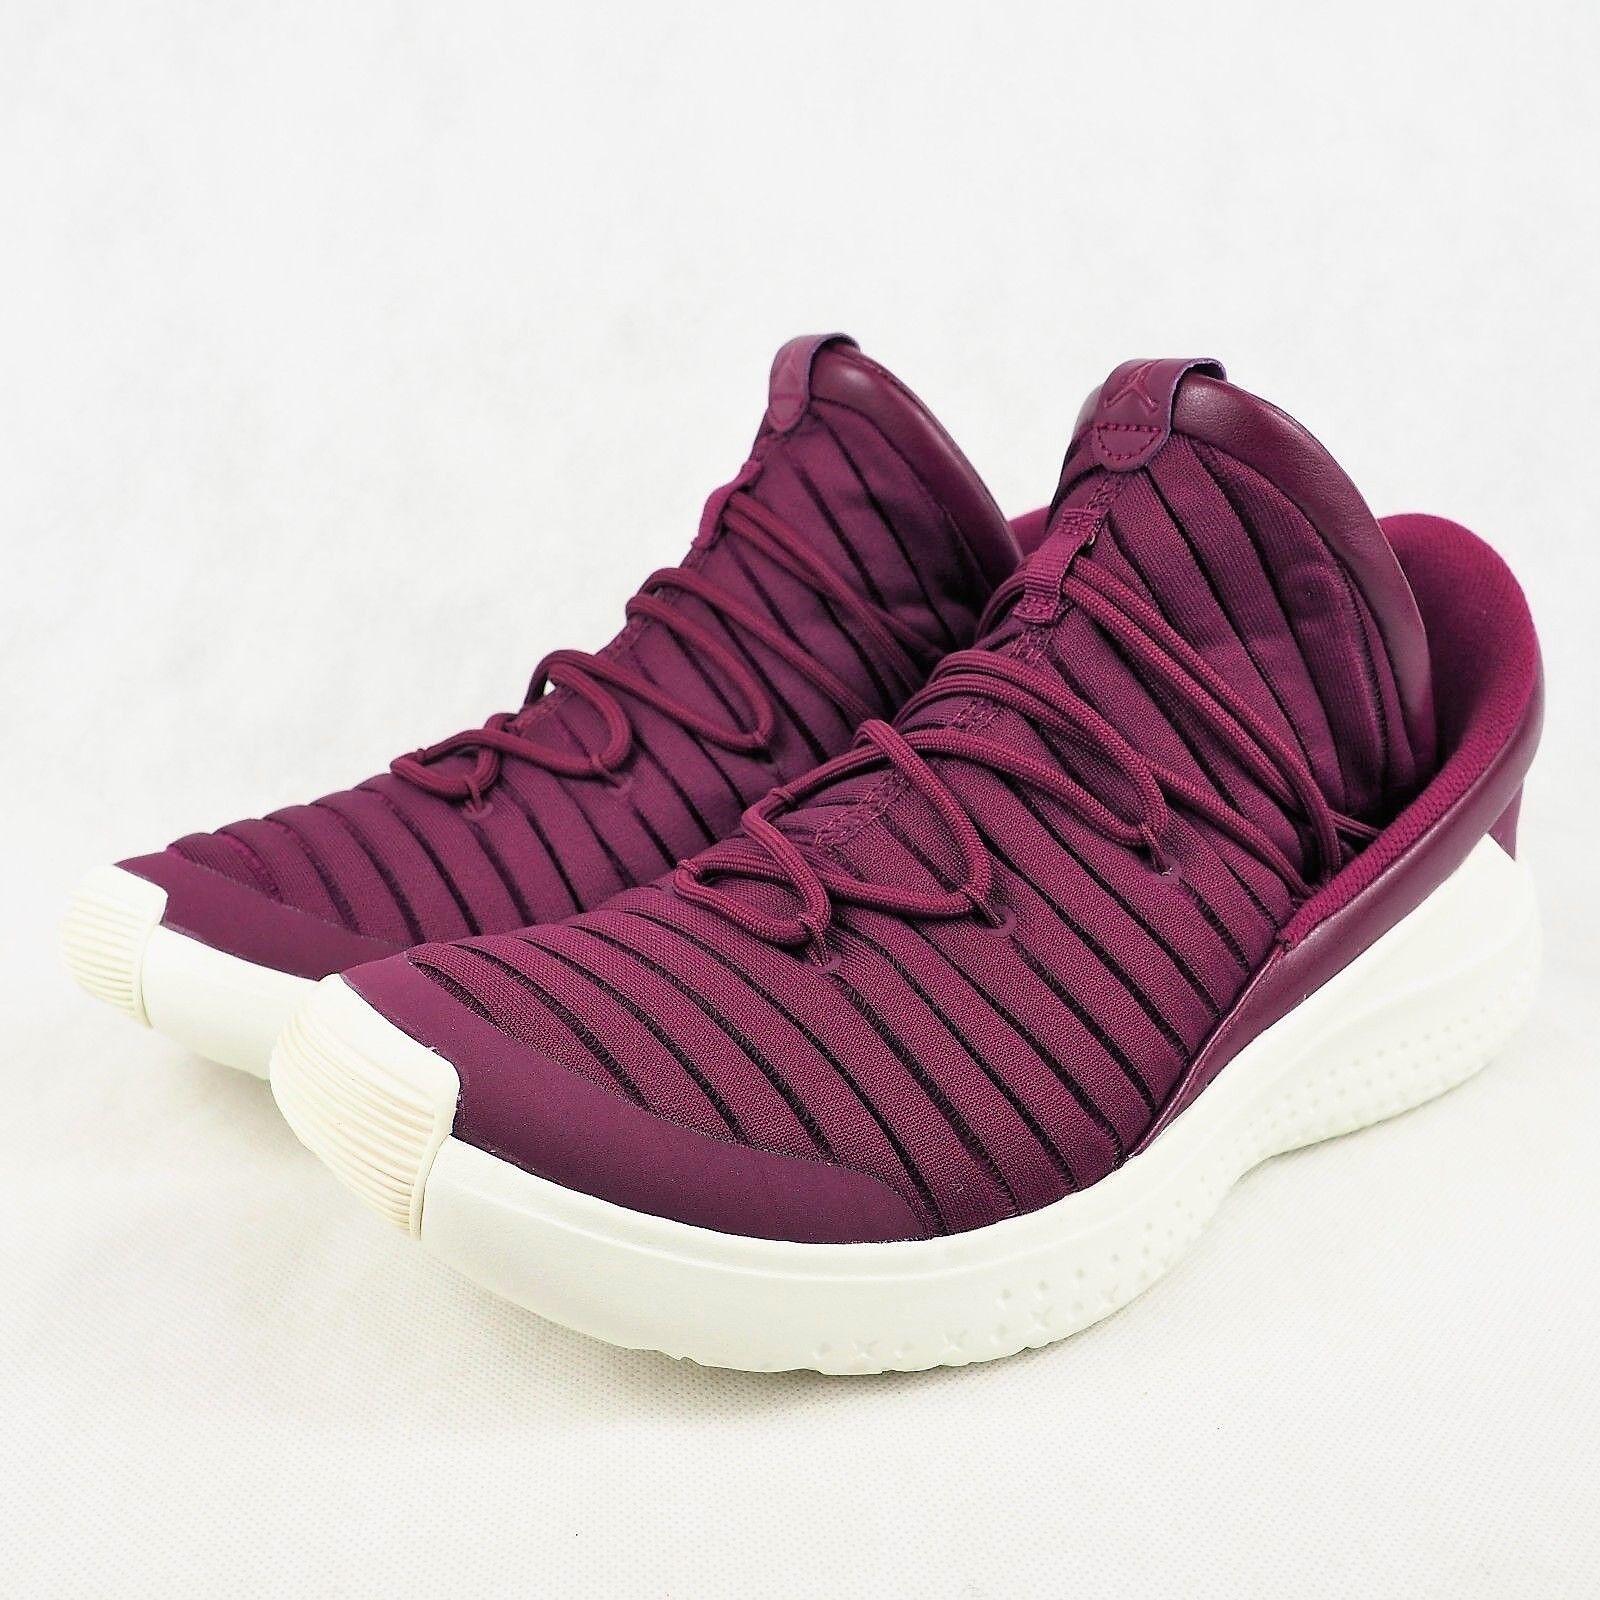 Nike Jordan Flight Luxe Training Shoes Mens Sizes 13 Bordeaux Sail 919715 637